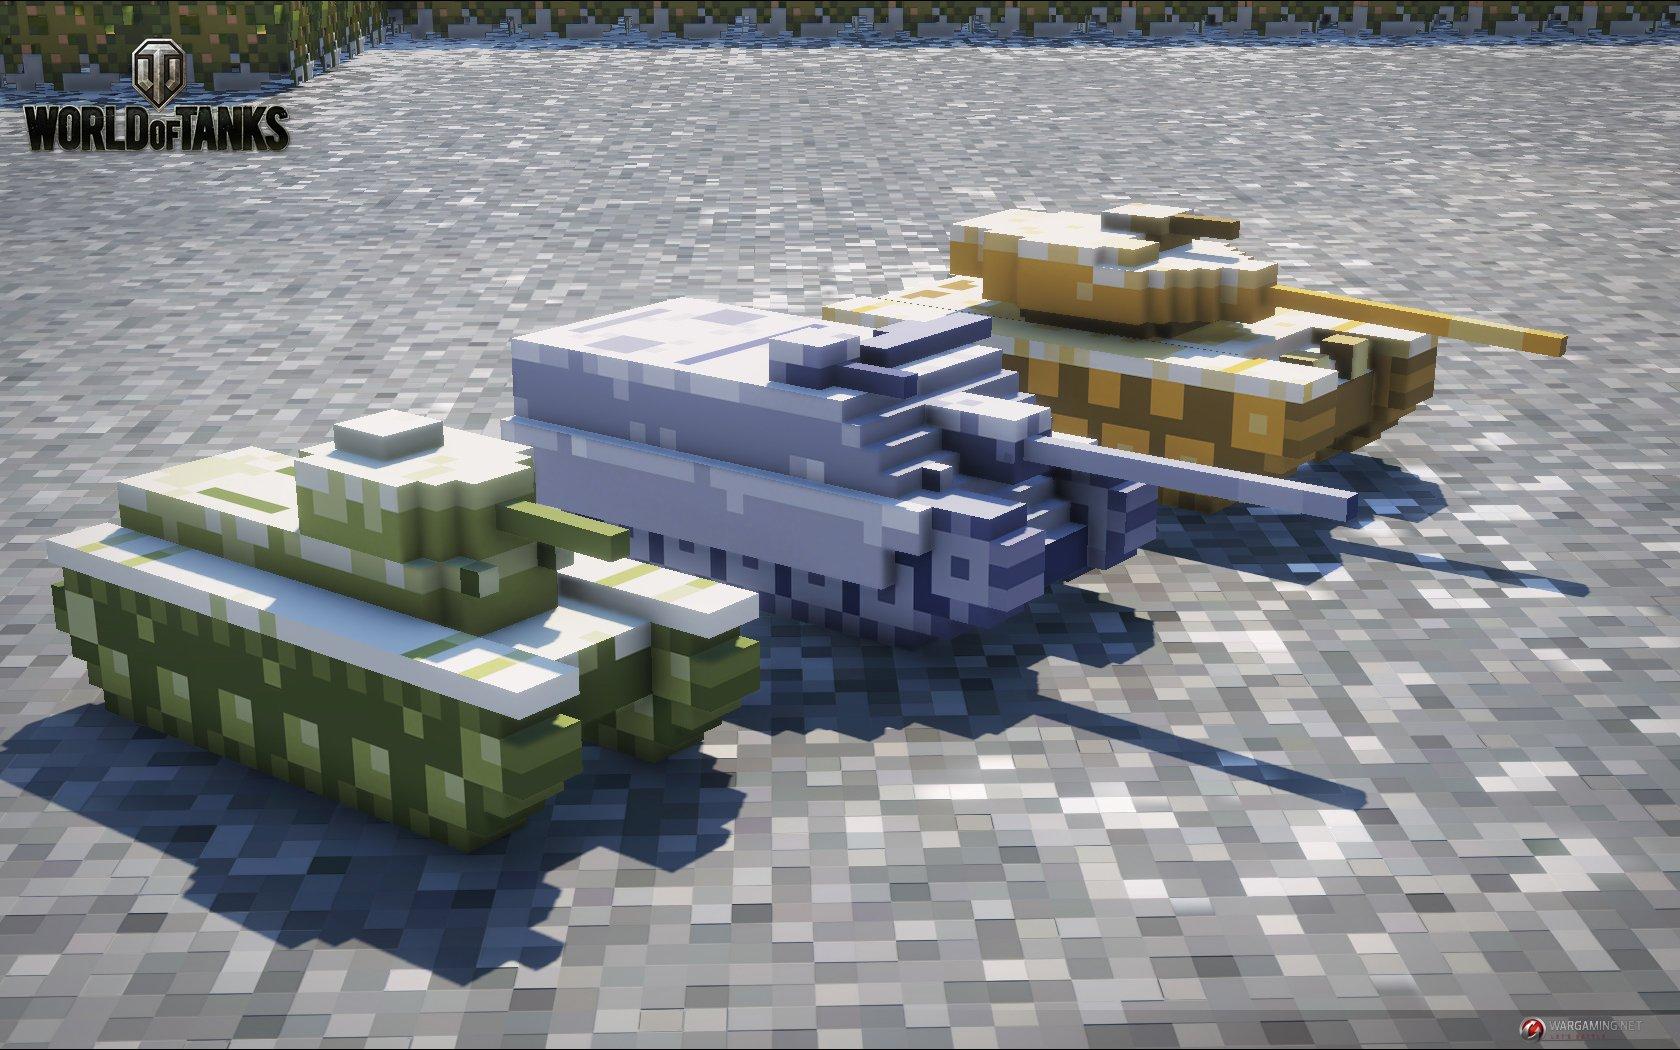 8 bit World of tanks: Зимняя битва - Изображение 1